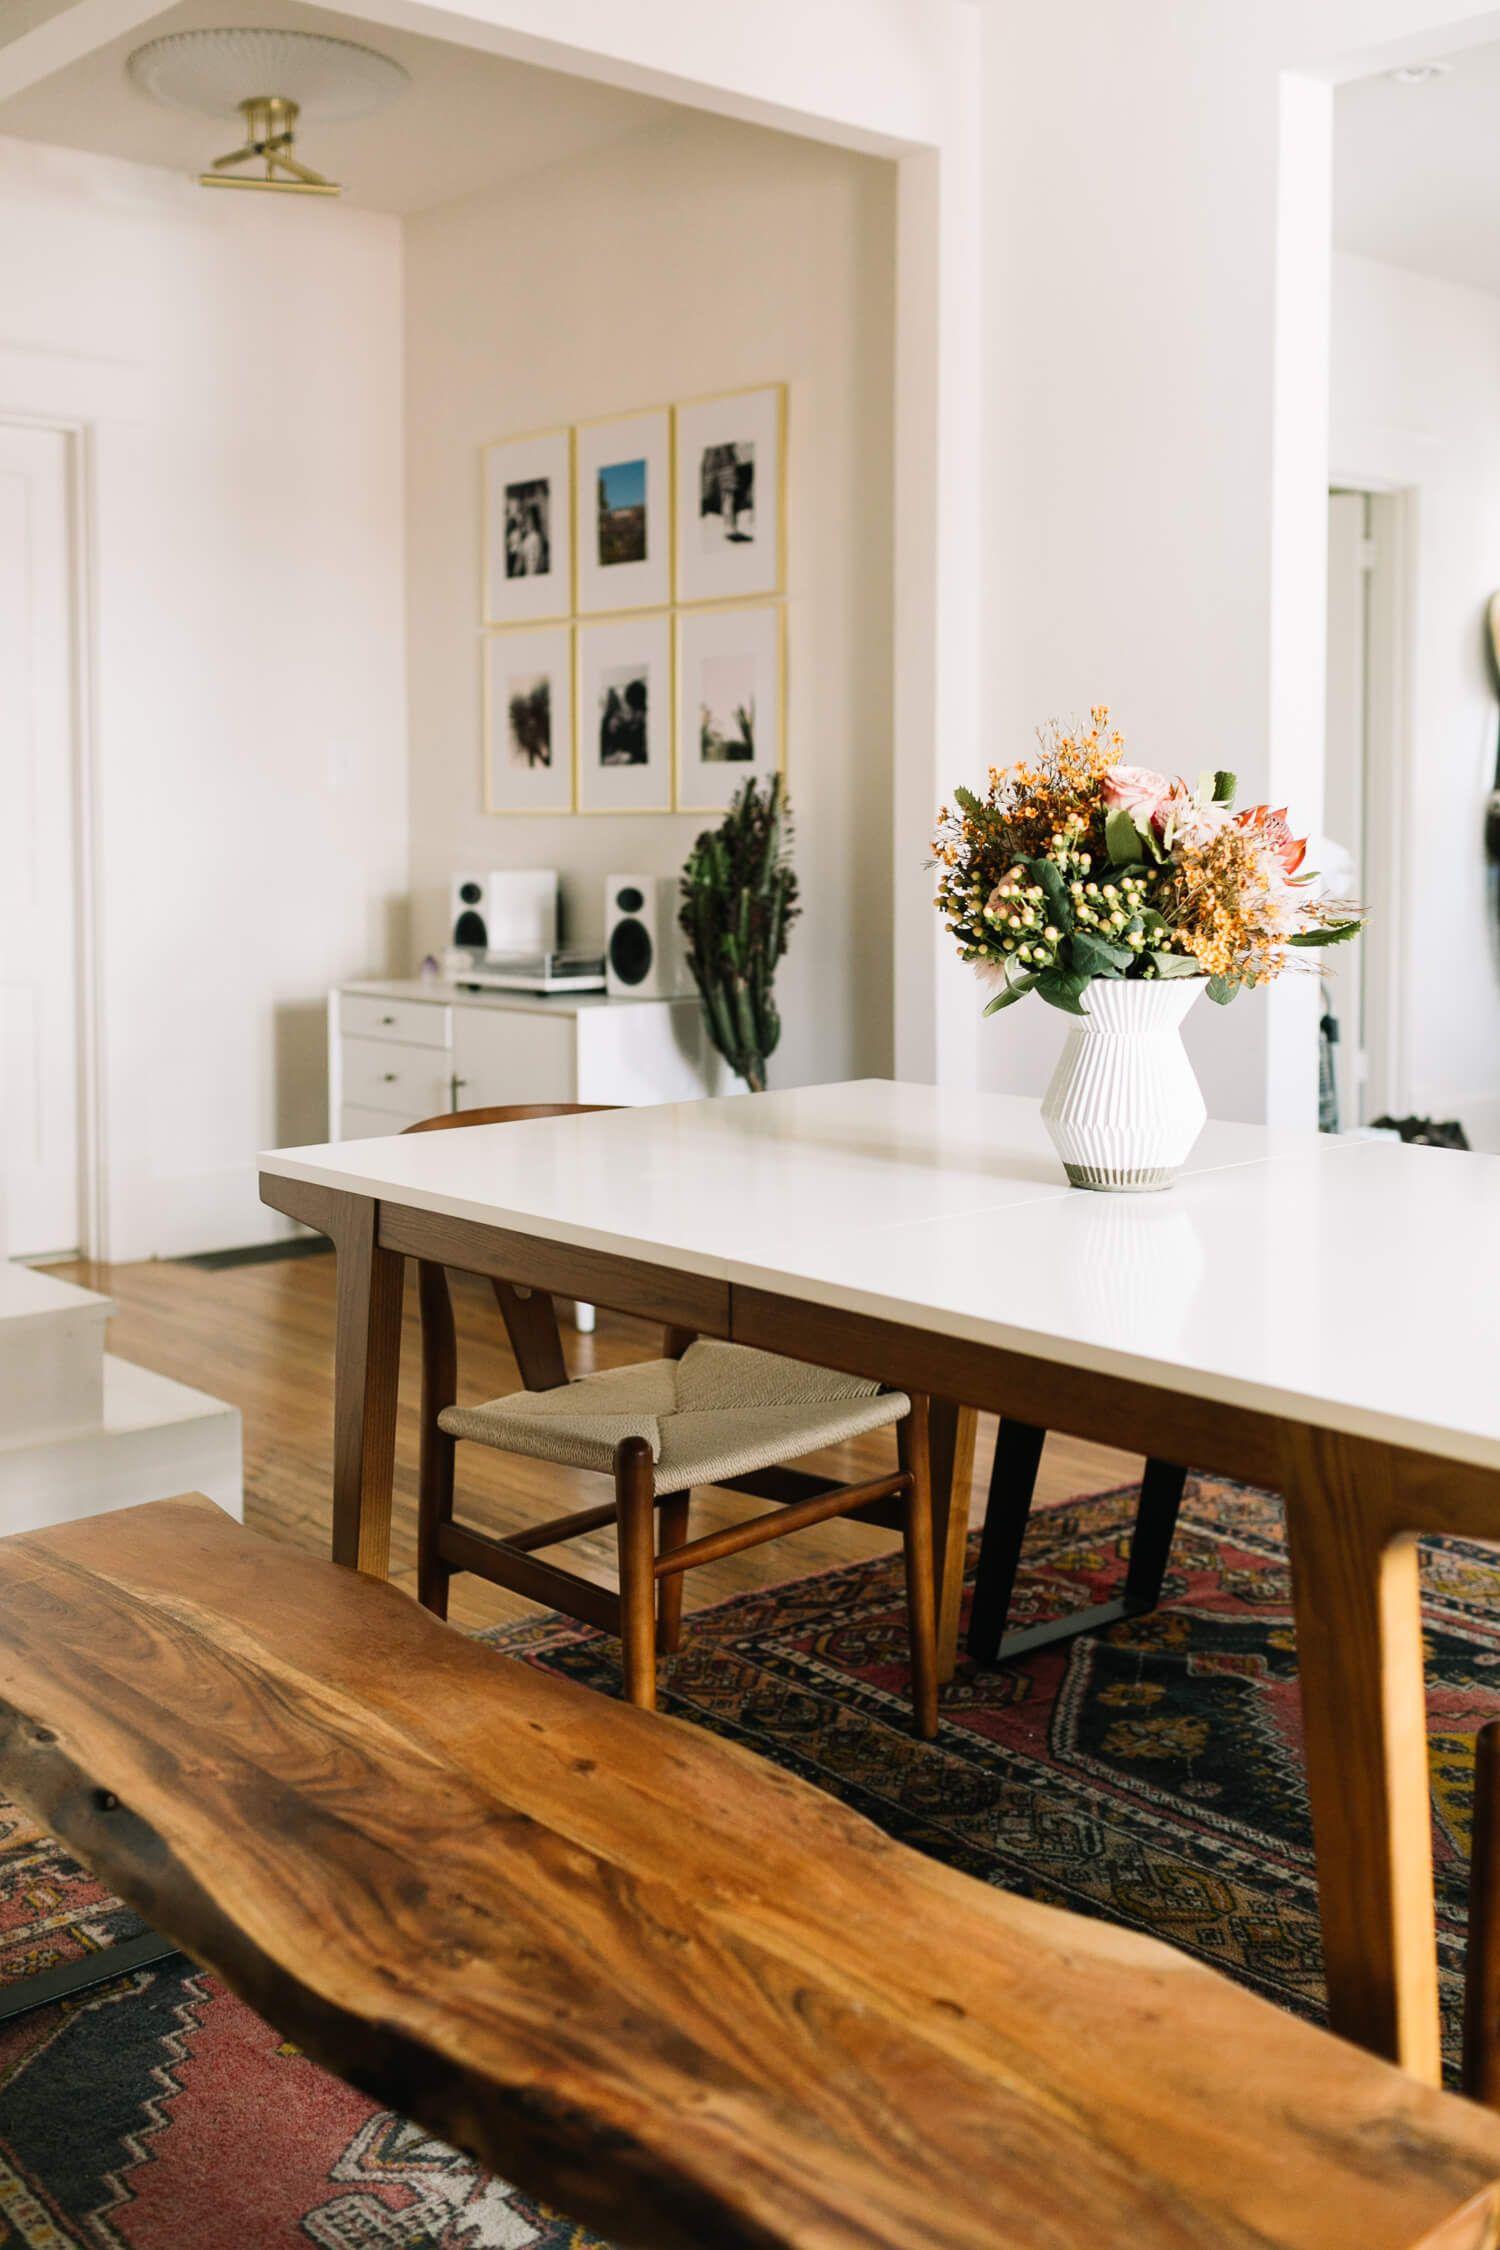 Kacey Musgraves Dining Room Tour – A Beautiful Mess